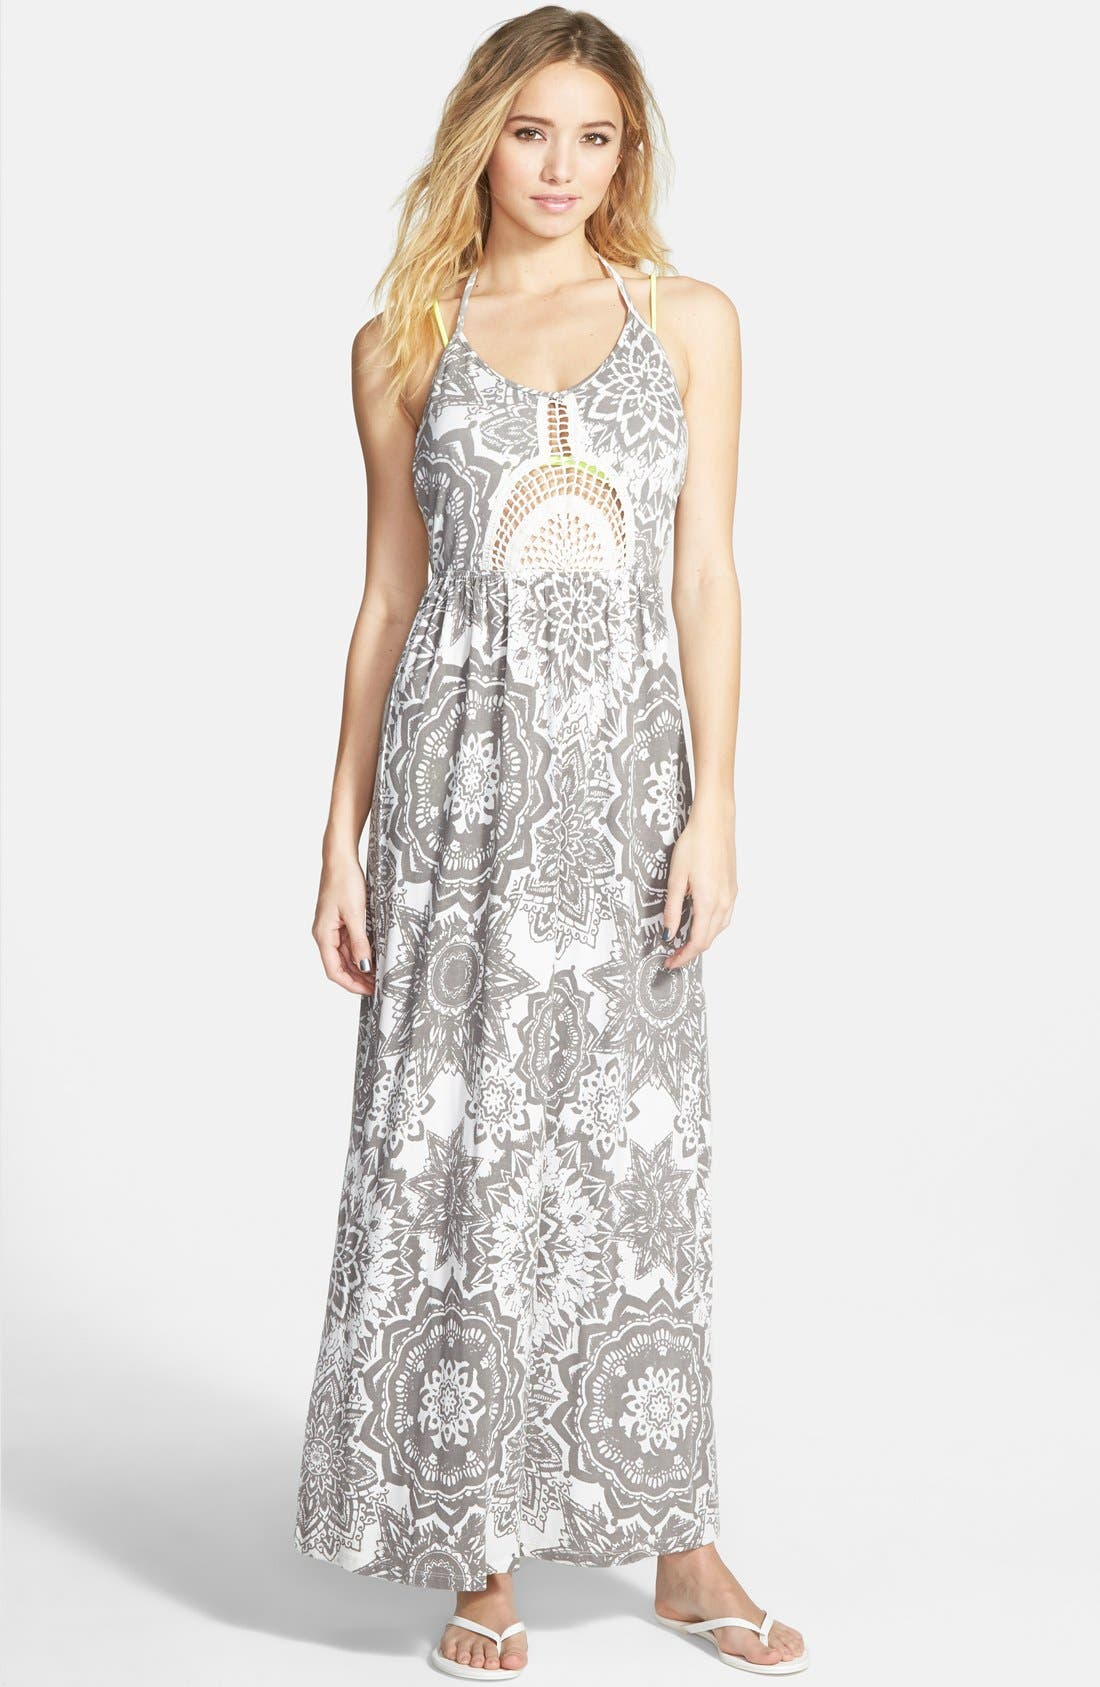 Alternate Image 1 Selected - Rip Curl 'Painted Desert' Halter Maxi Dress